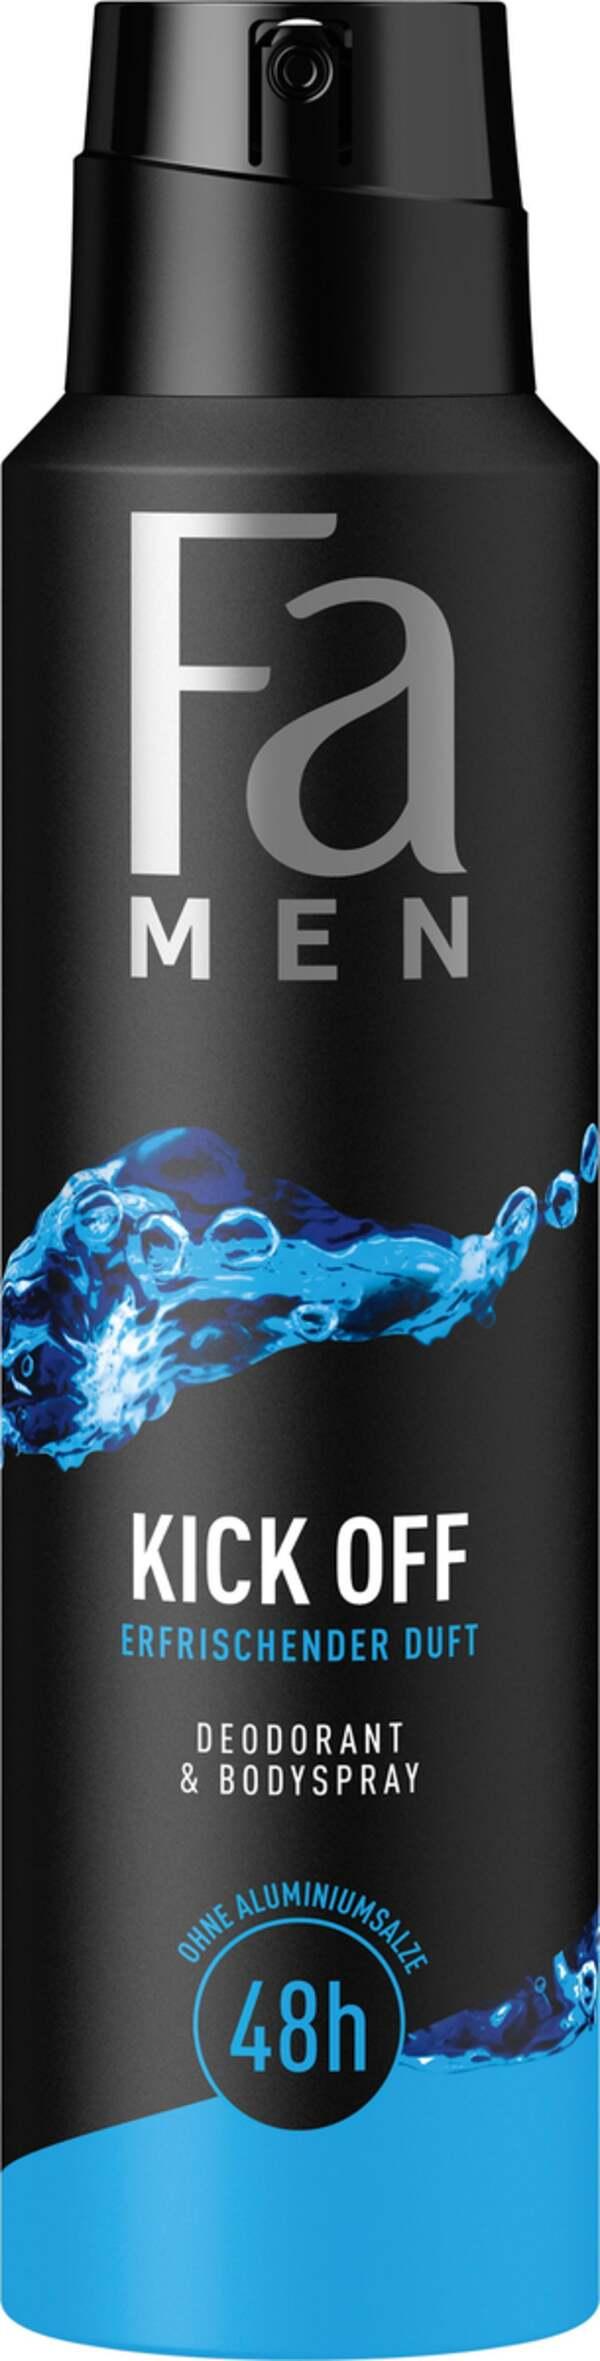 Fa Men Deodorant & Bodyspray Kick Off